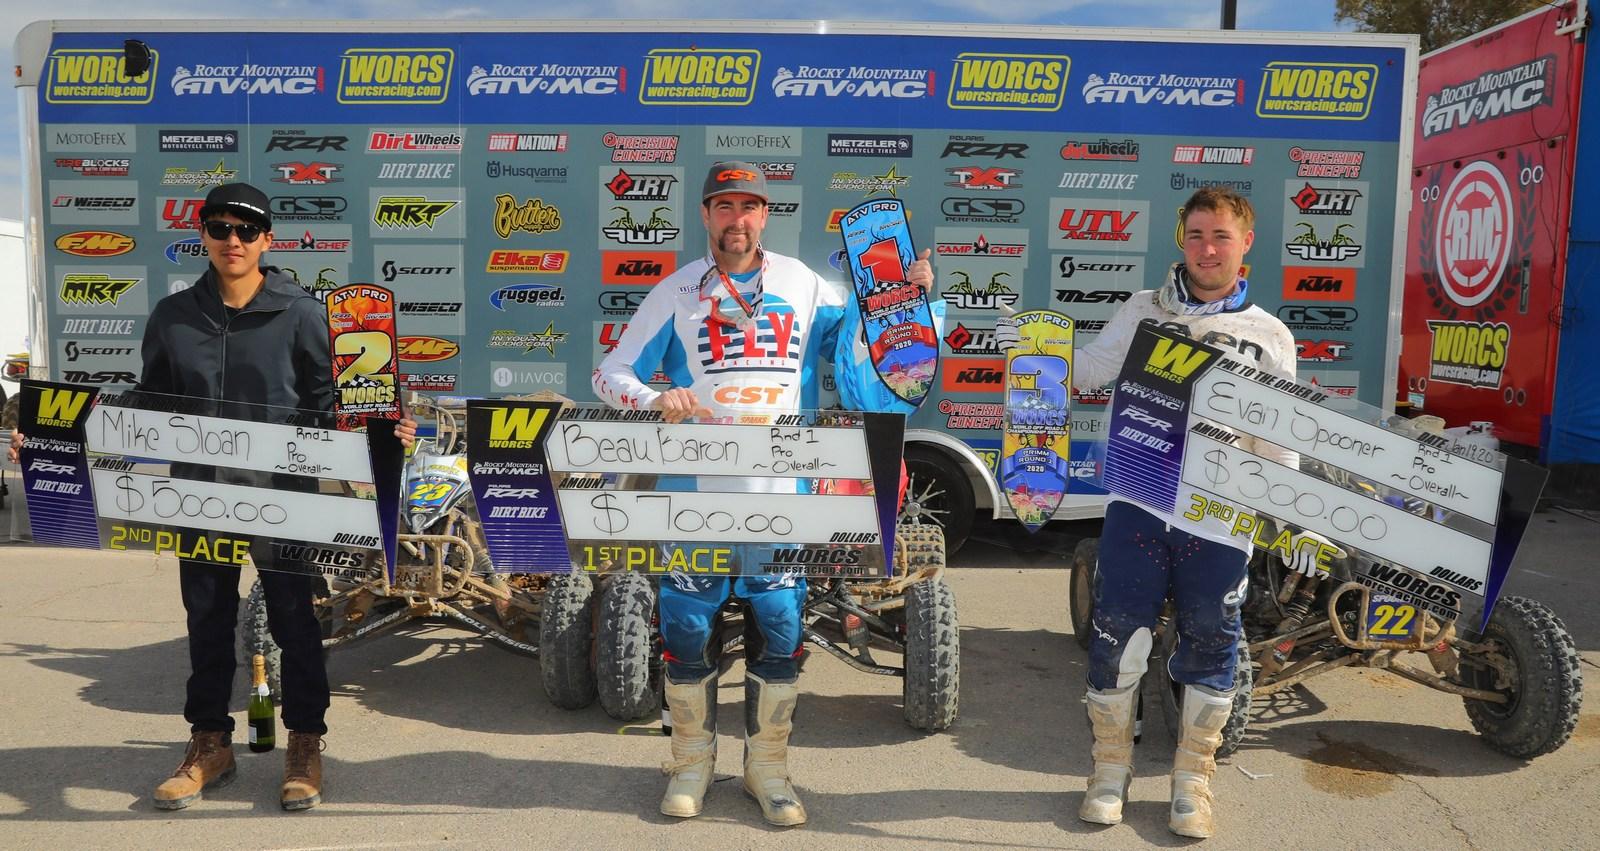 2020-01-podium-pro-atv-worcs-racing